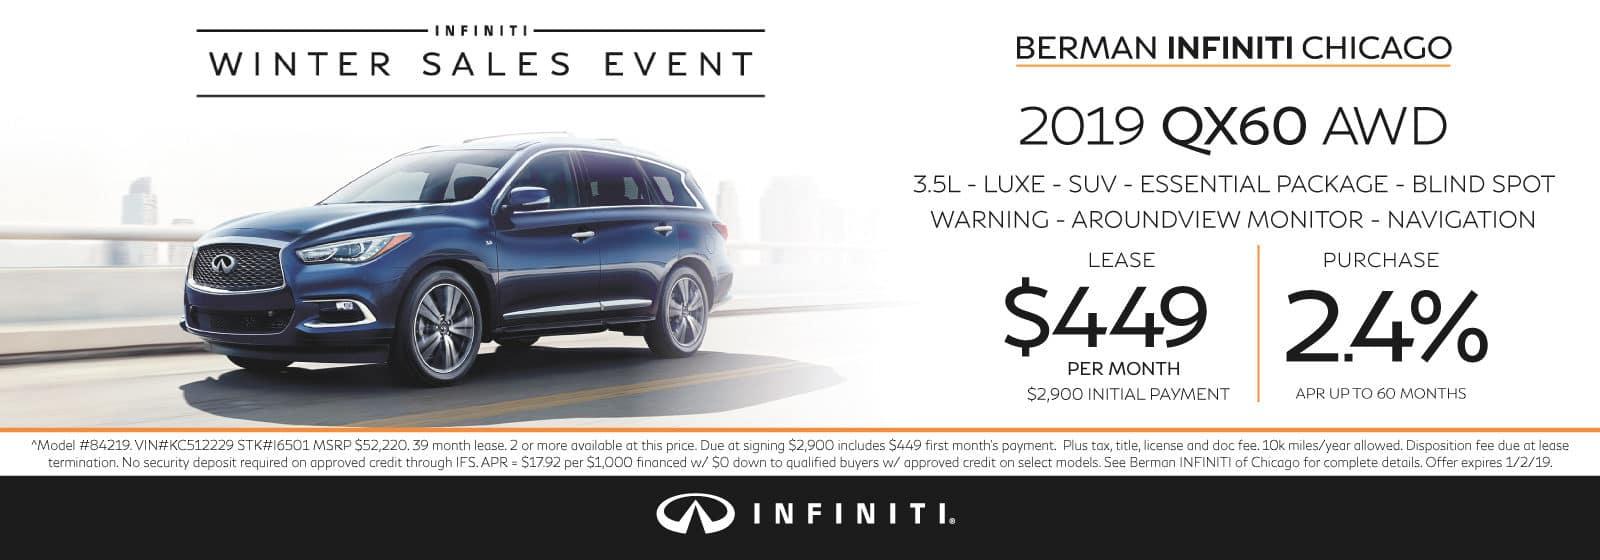 New 2019 INFINITI QX60 December offer at Berman INFINITI Chicago!